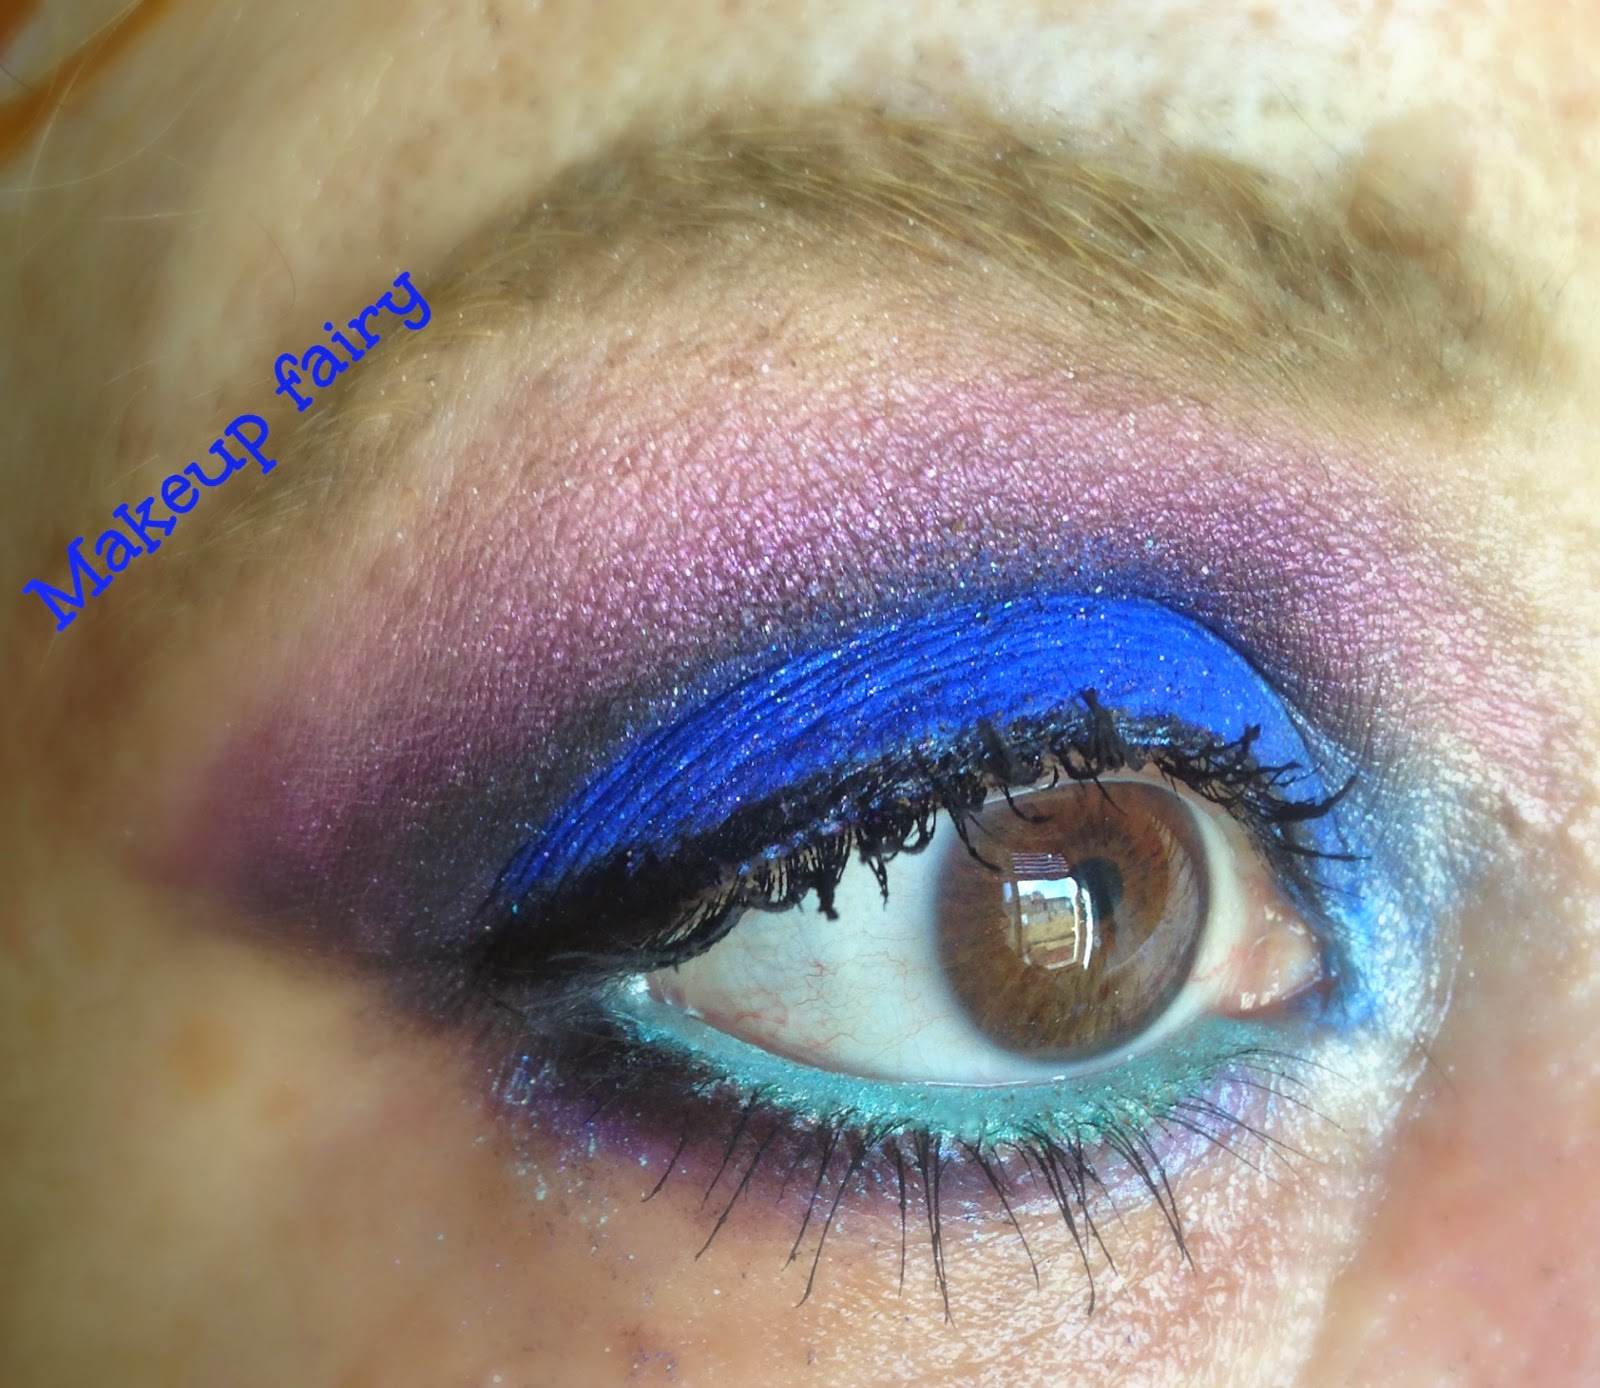 Blue eye makeup looks